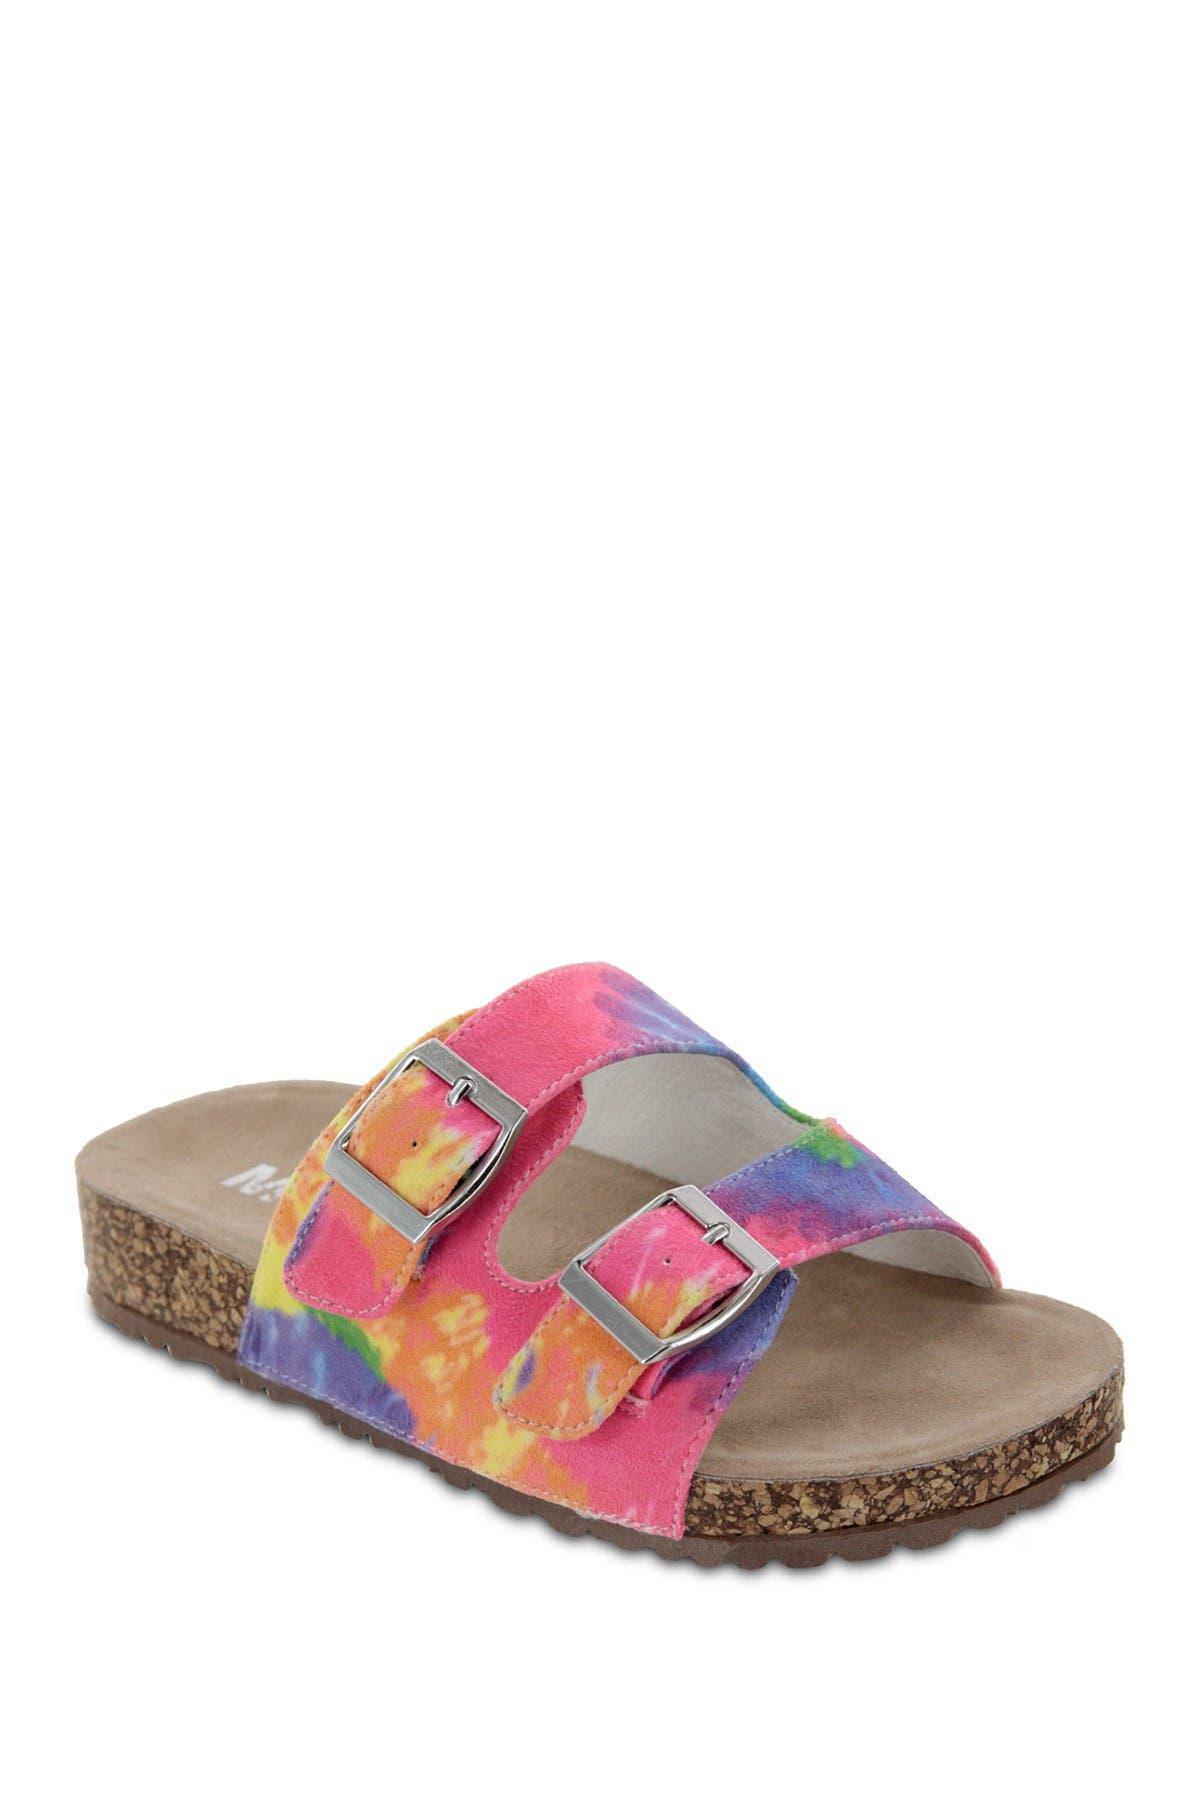 Image of MIA Deisy Footbed Sandal